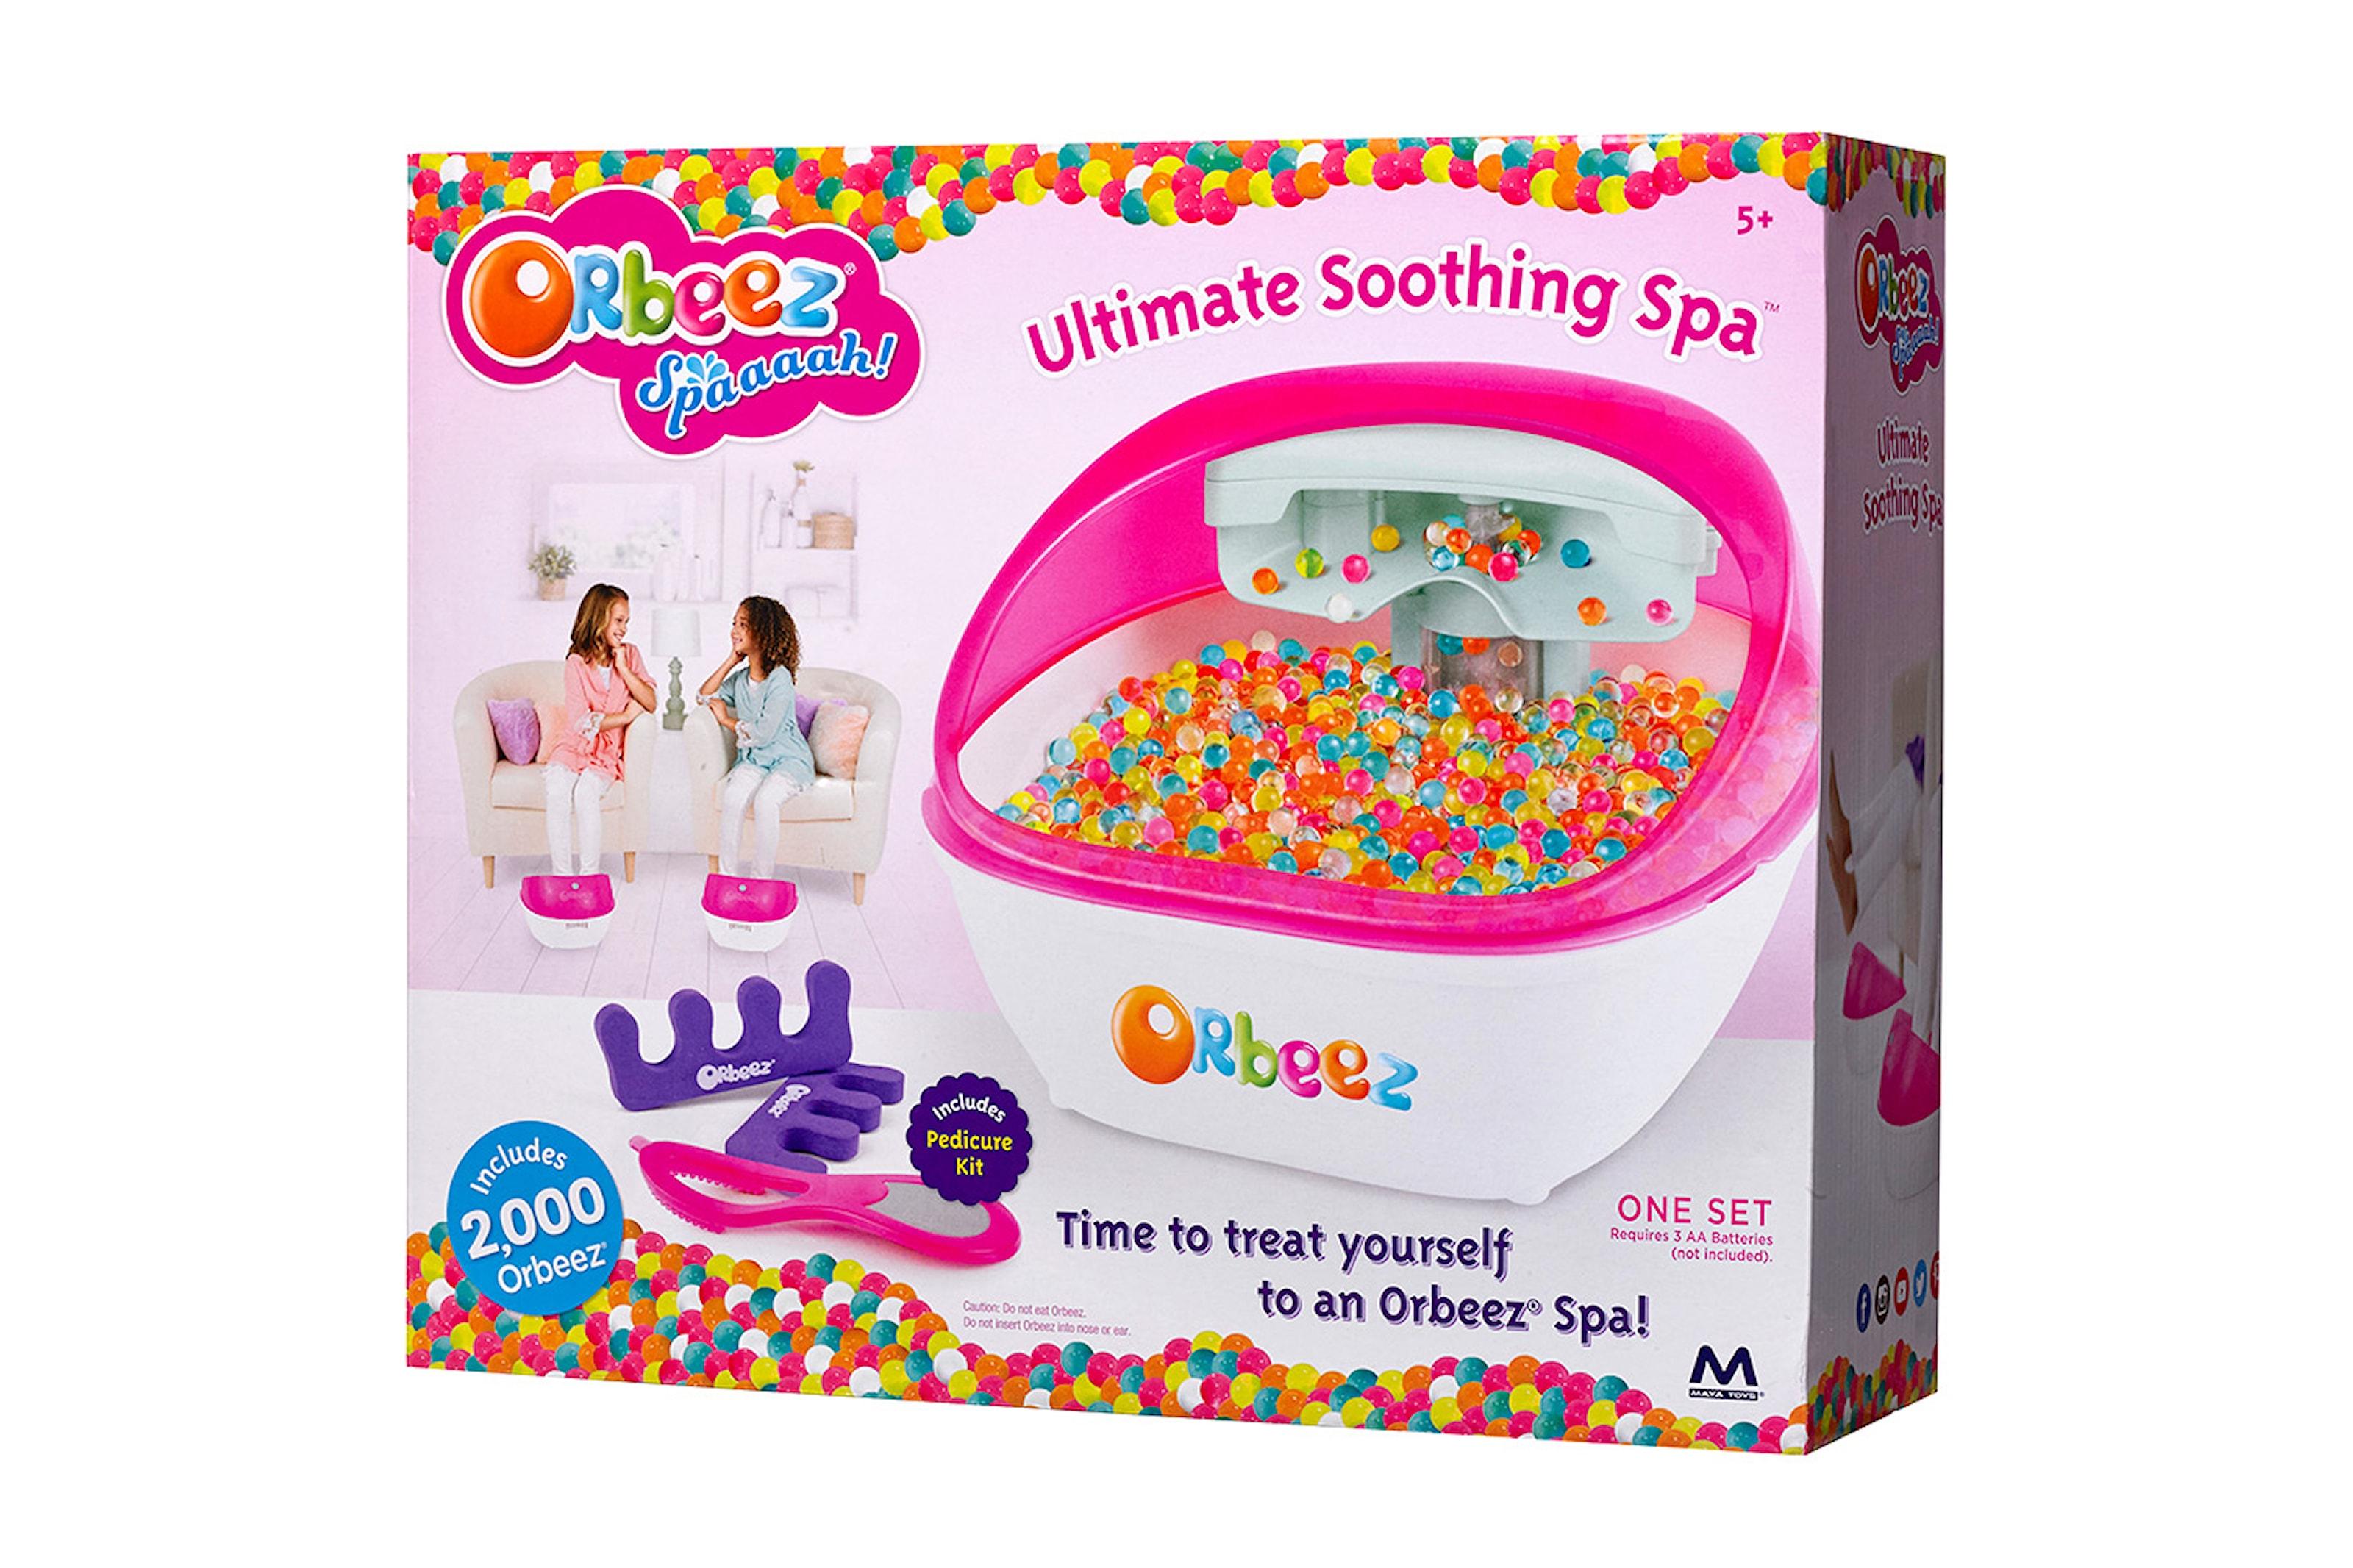 Orbeez® Ultimate Soothing Spa